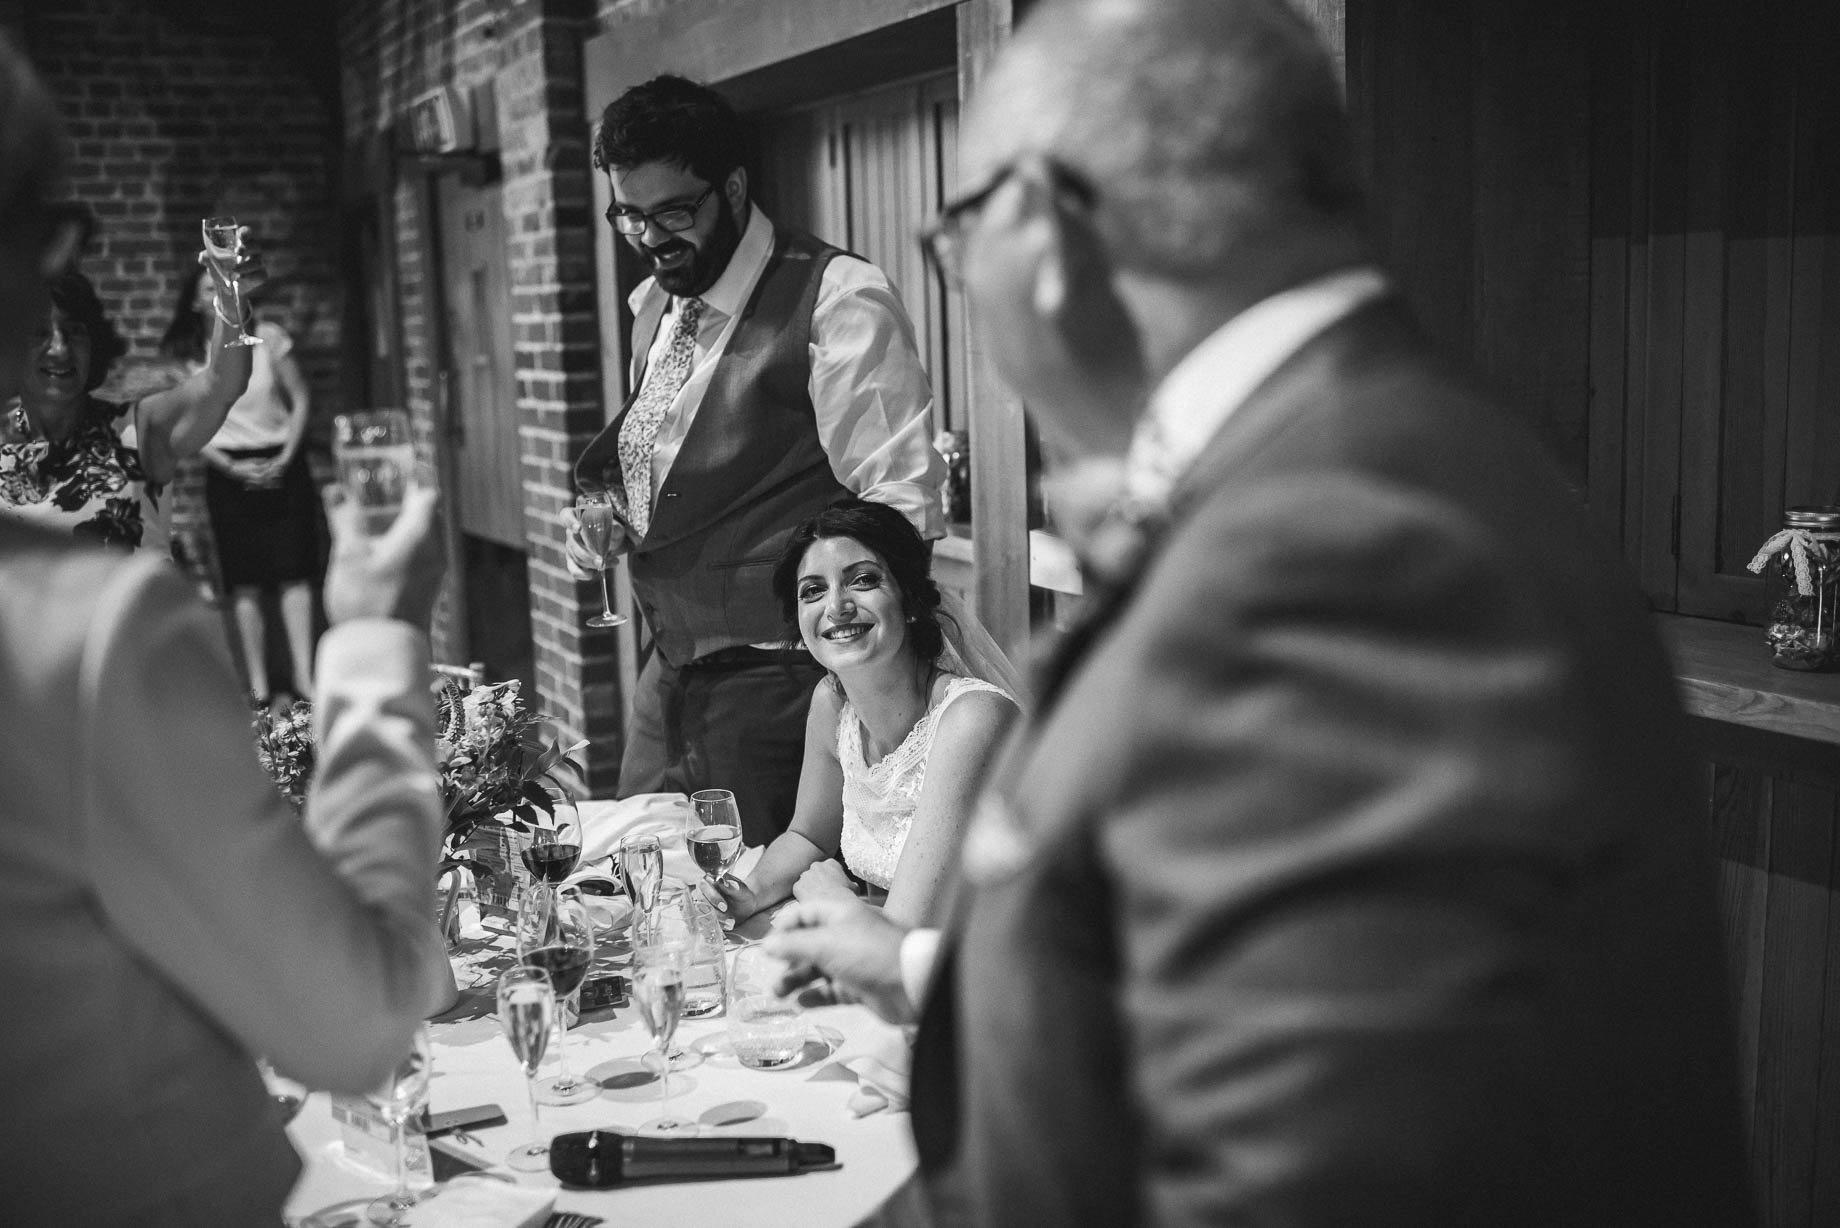 Gaynes Park wedding photography - Guy Collier Photography - Rachel and Jon (121 of 169)